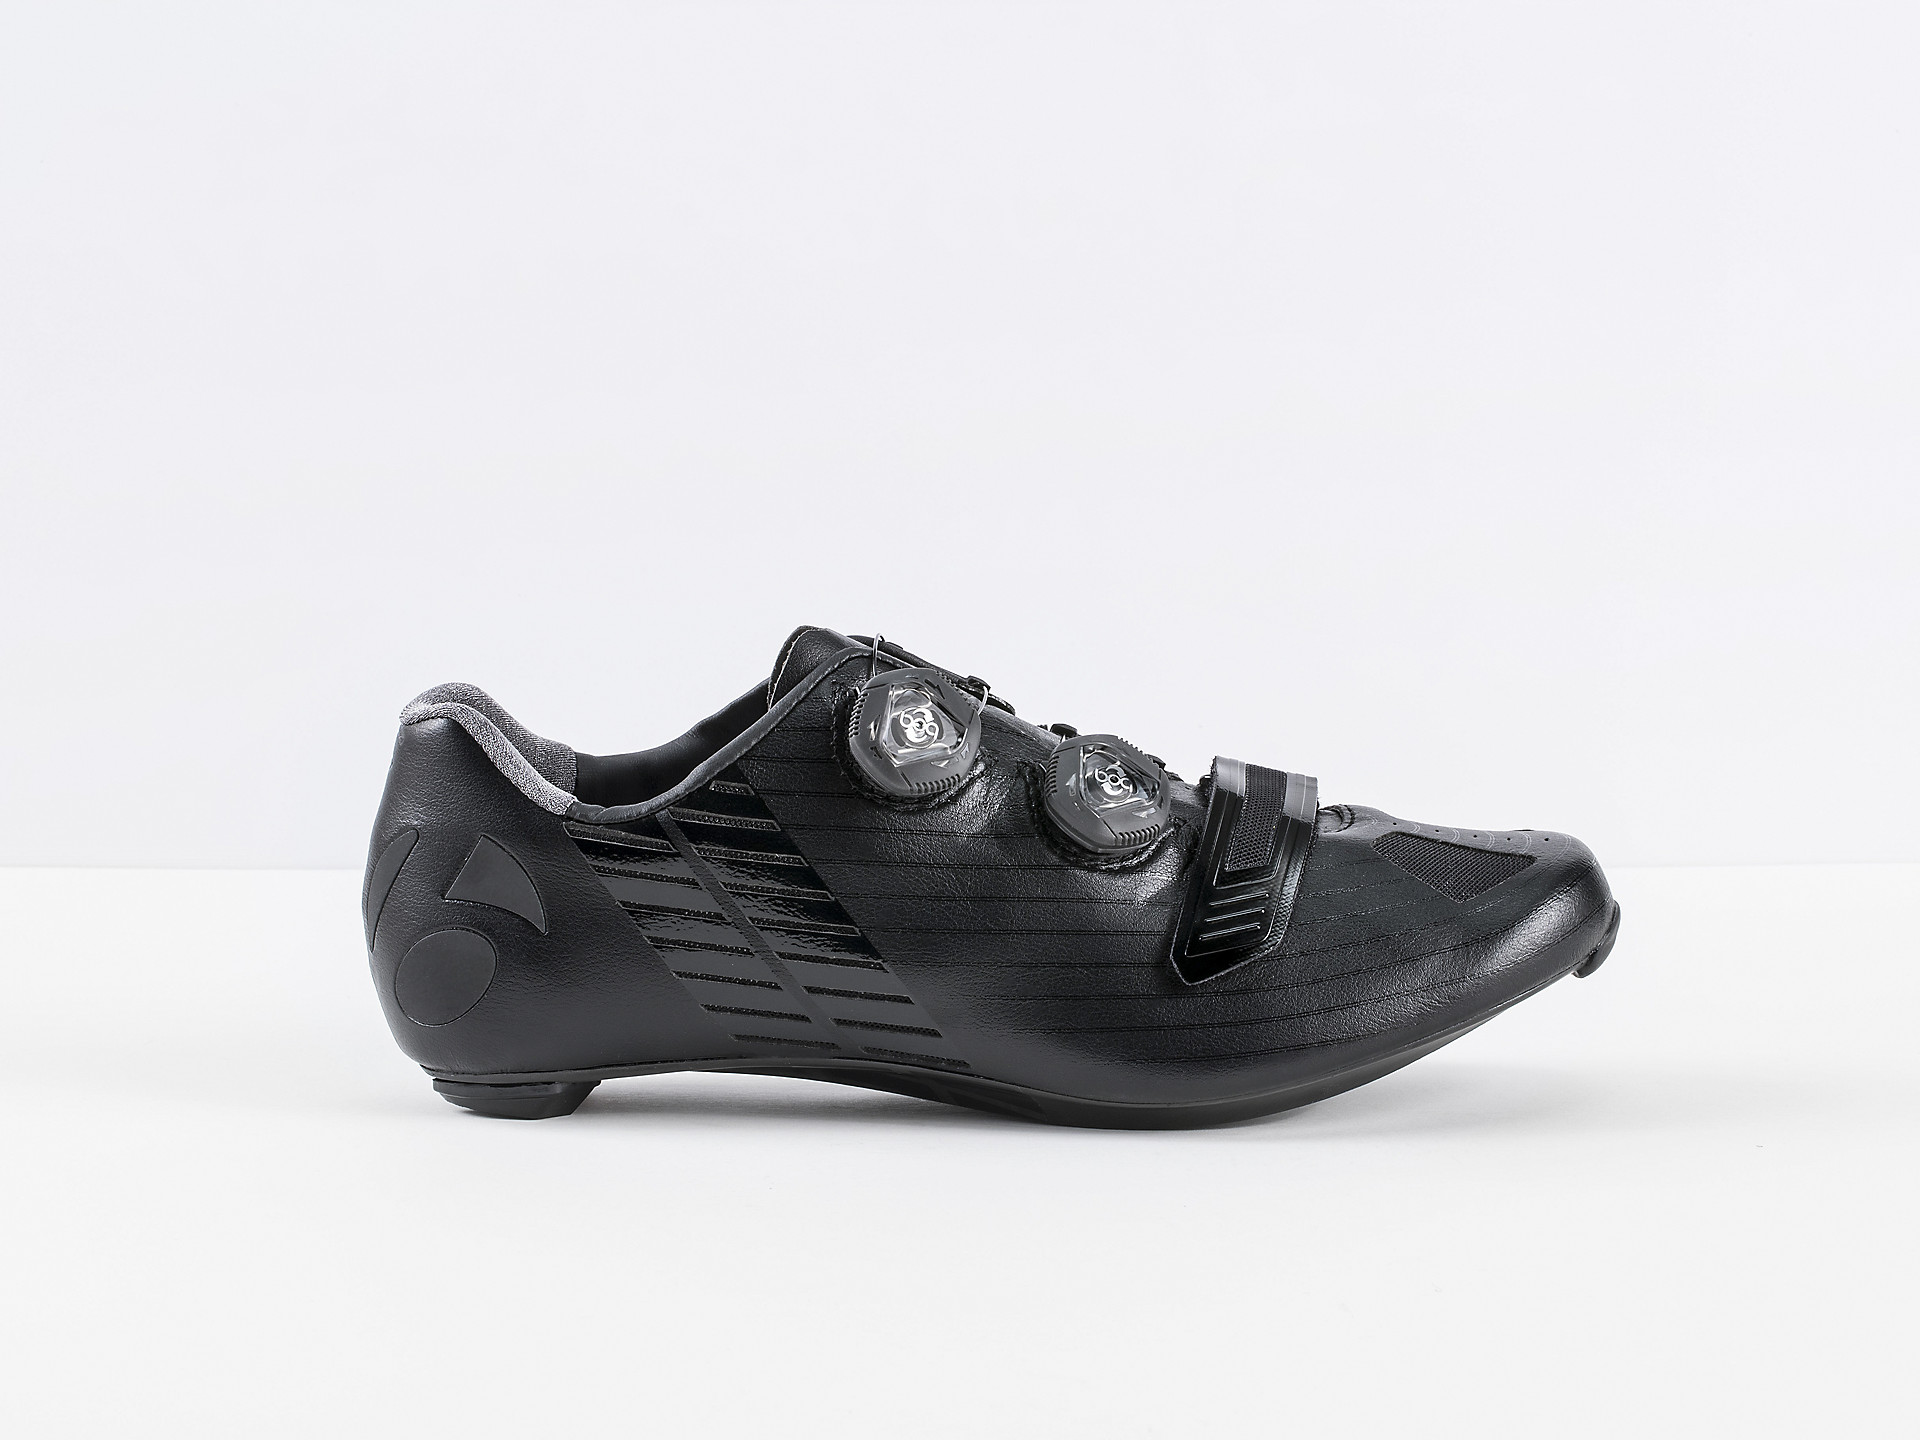 940d27a23a73b1 Chaussures route Bontrager XXX | Trek Bikes (CA)